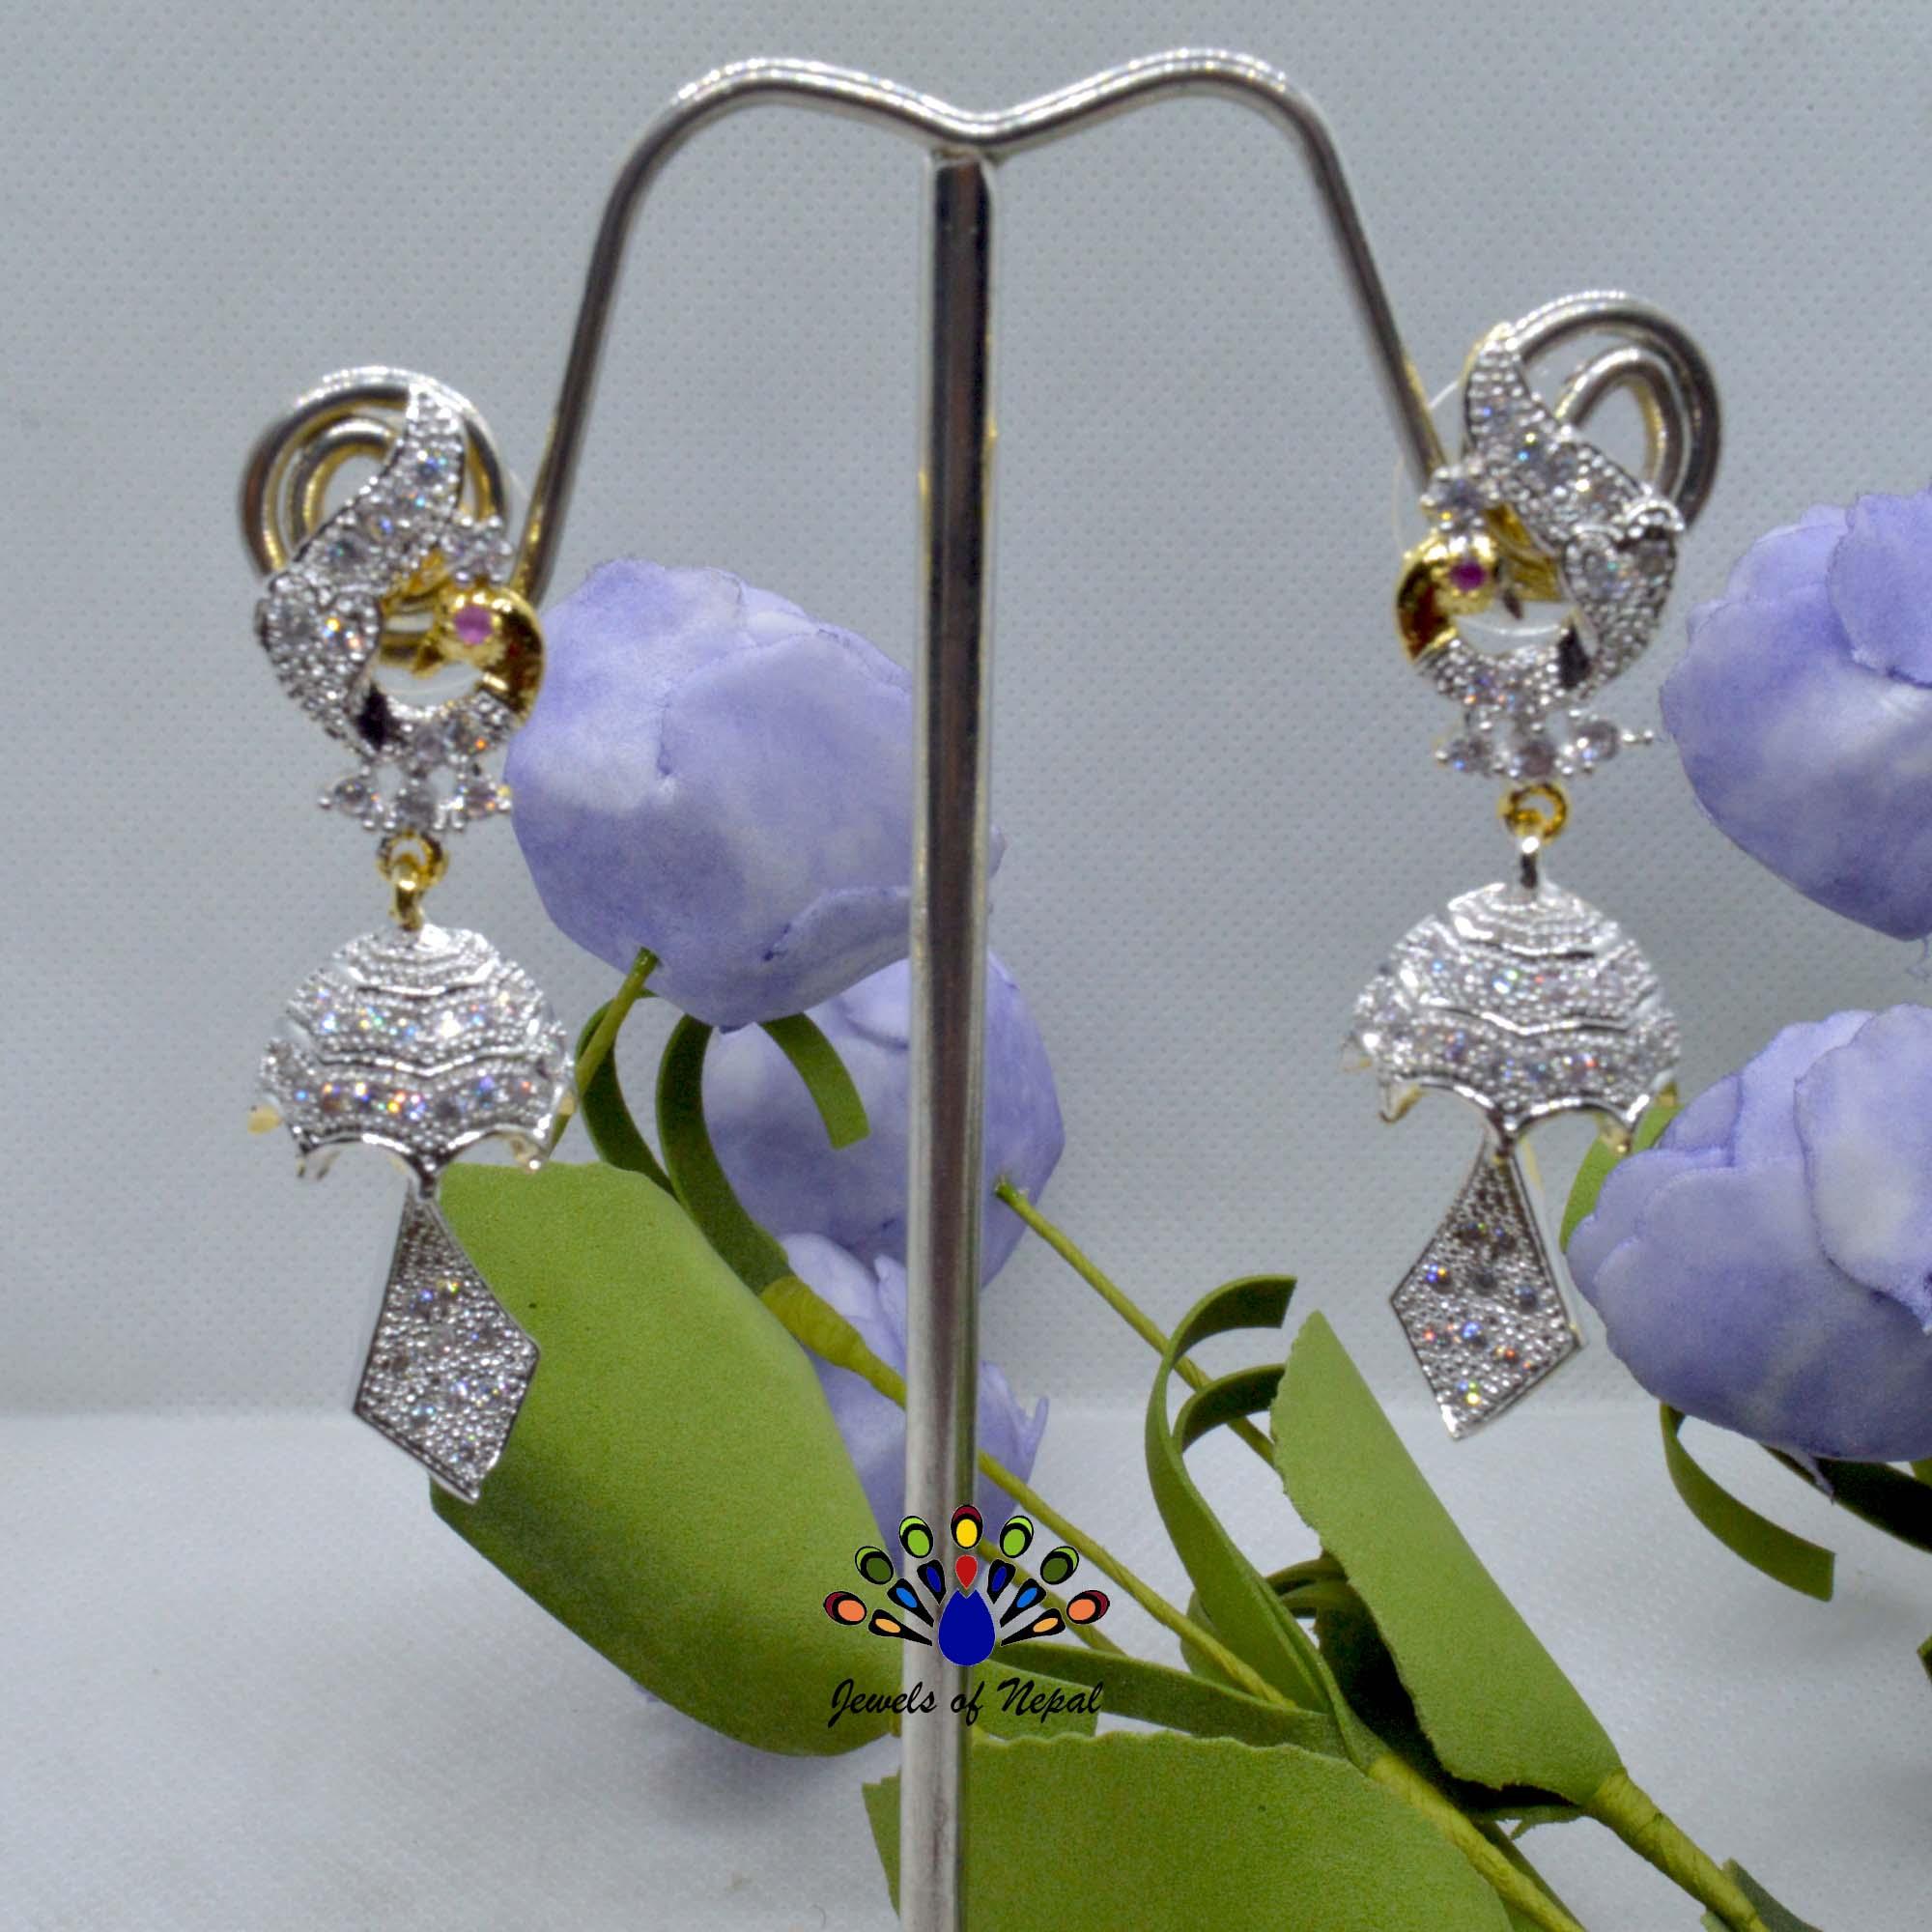 American Diamond (A.D.) Stone Studded Peacock Designed Pinjada Earrings For Women